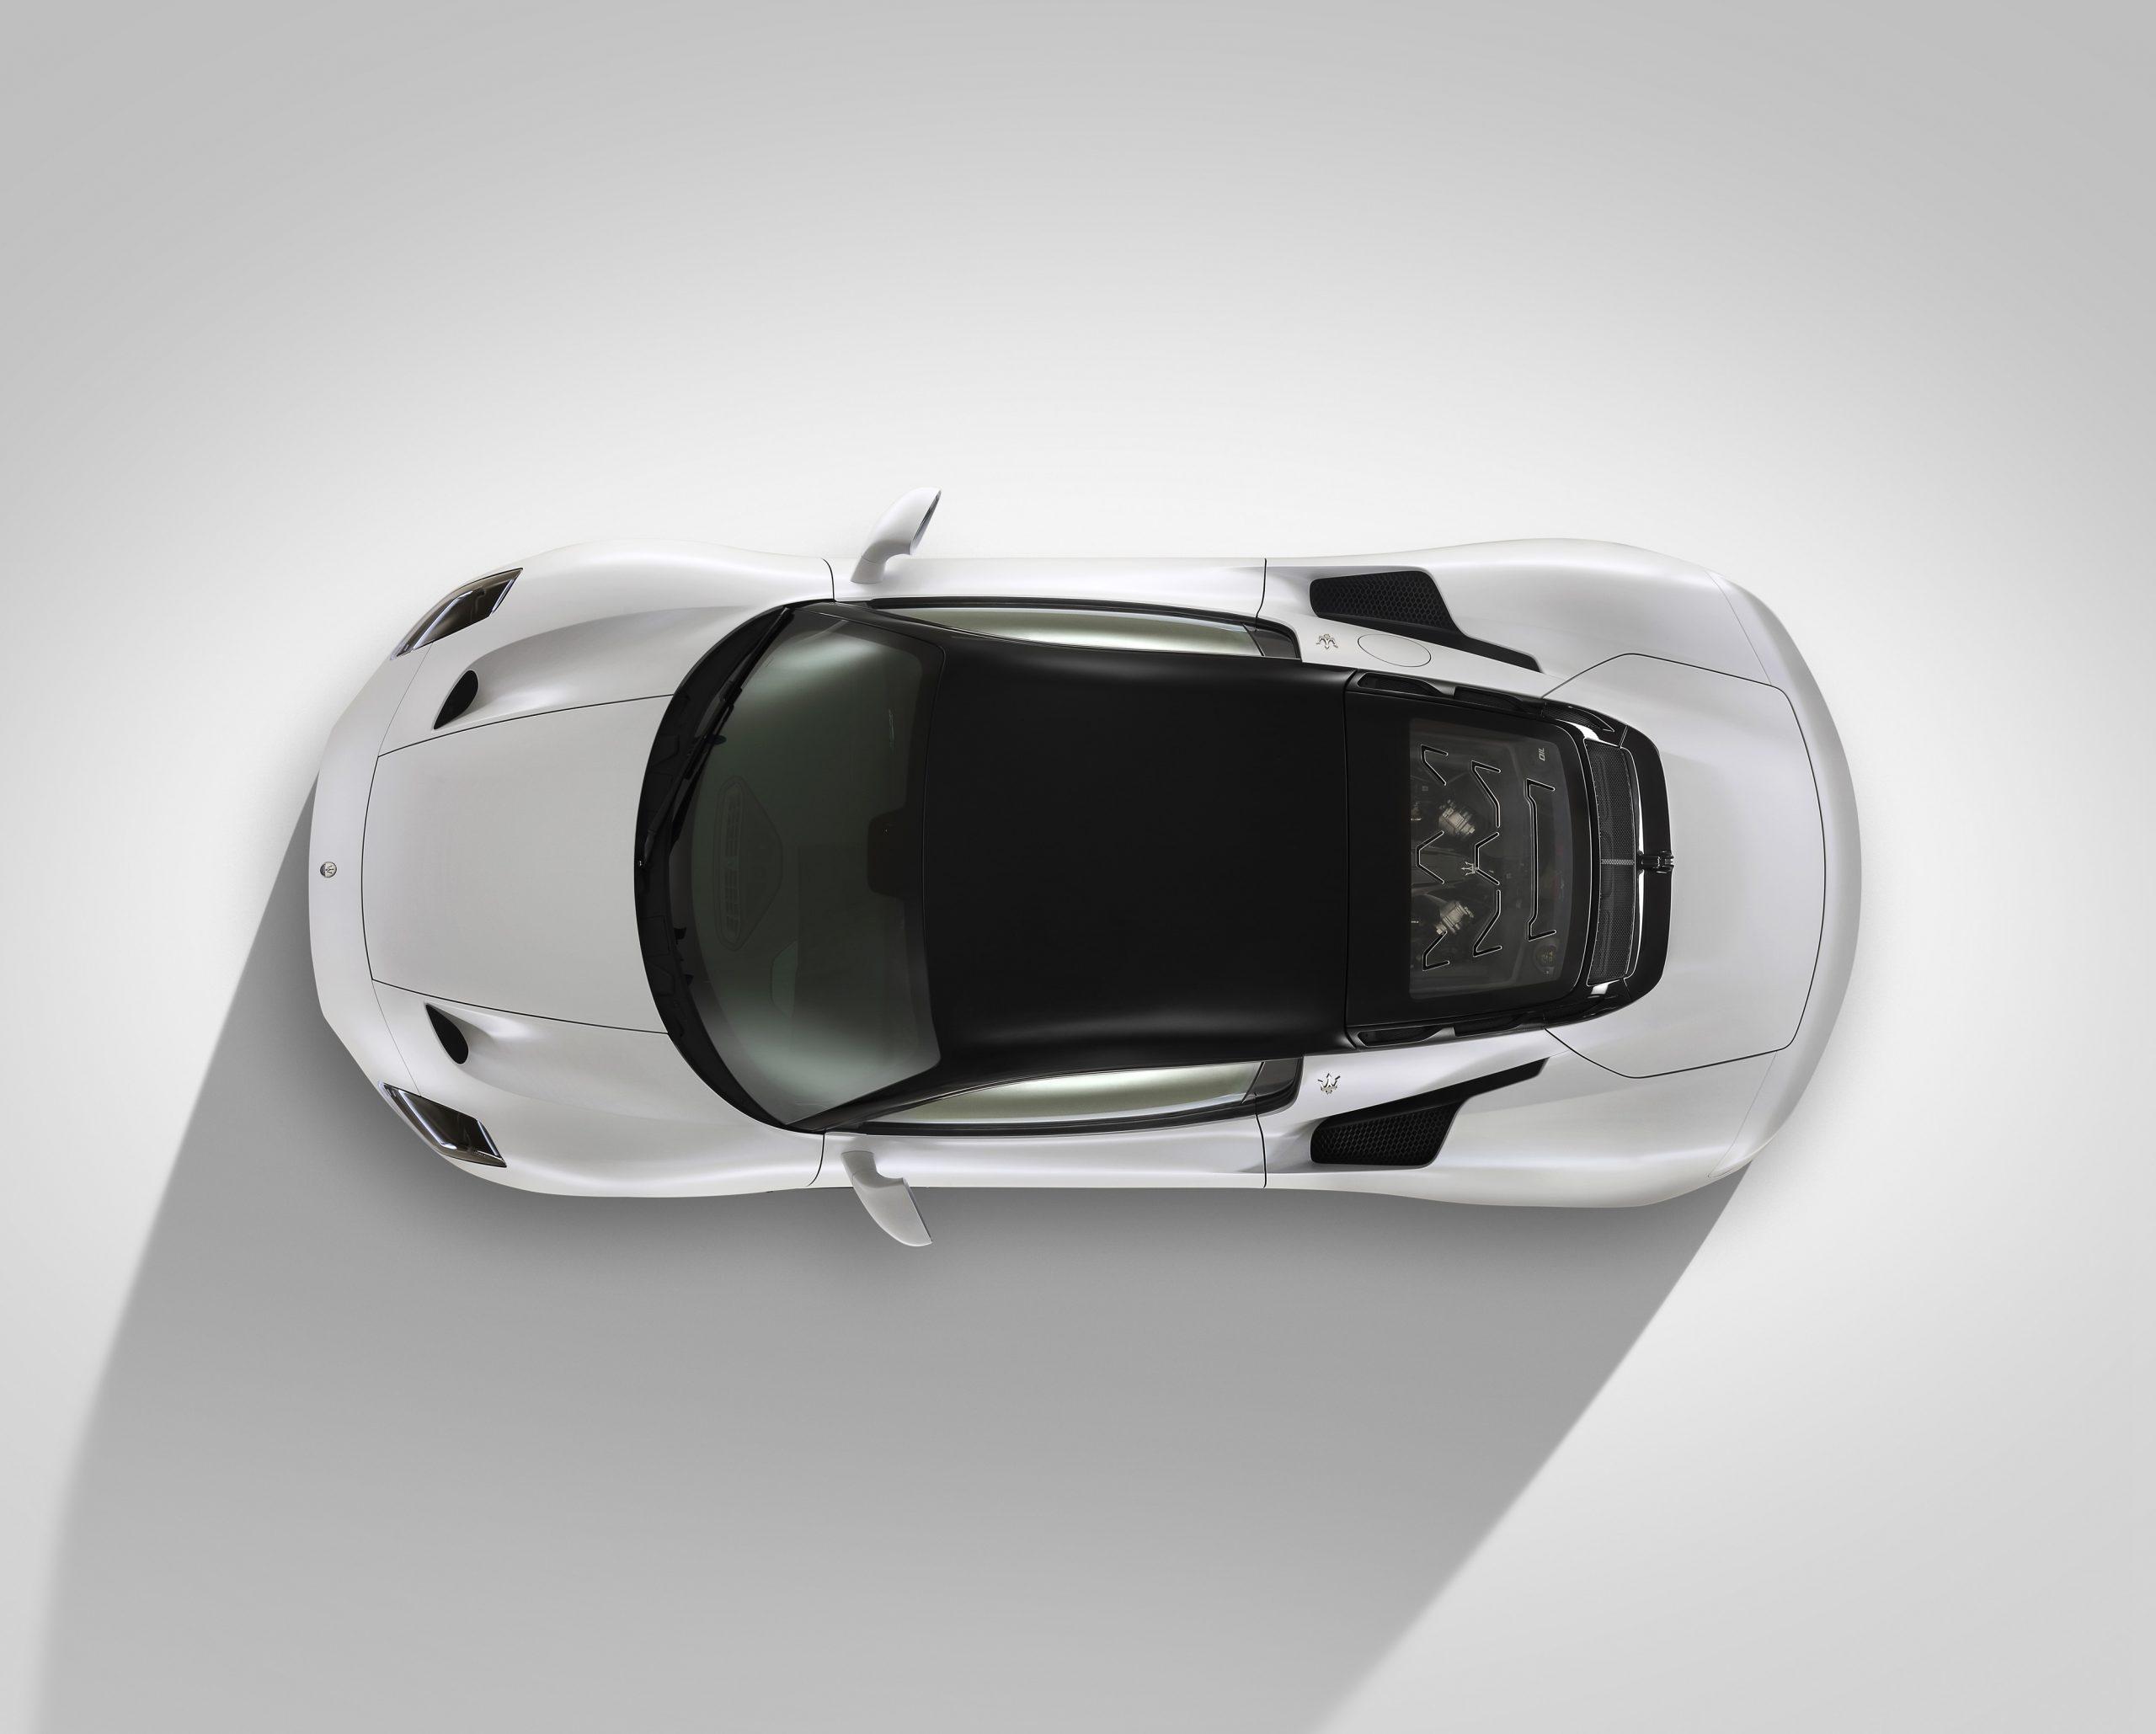 Maserati MC20 overhead